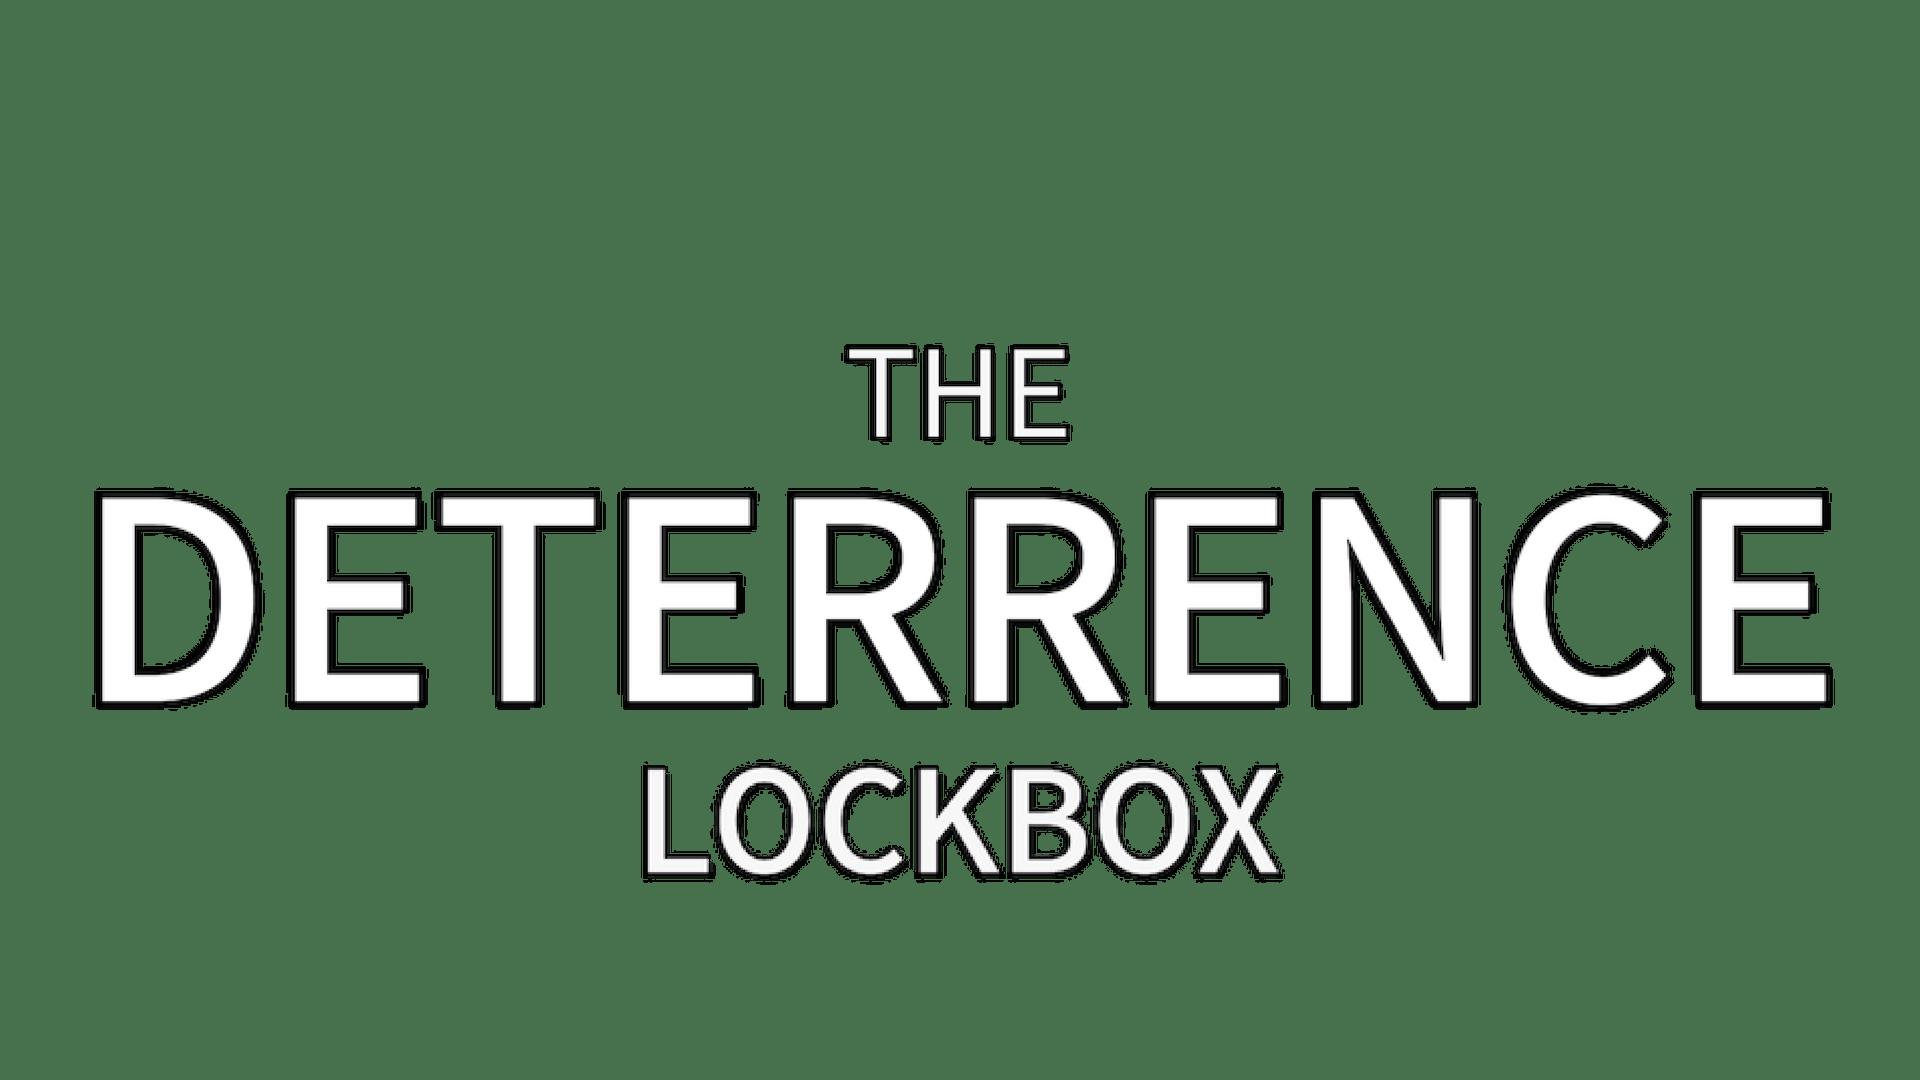 The Deterrence Lockbox